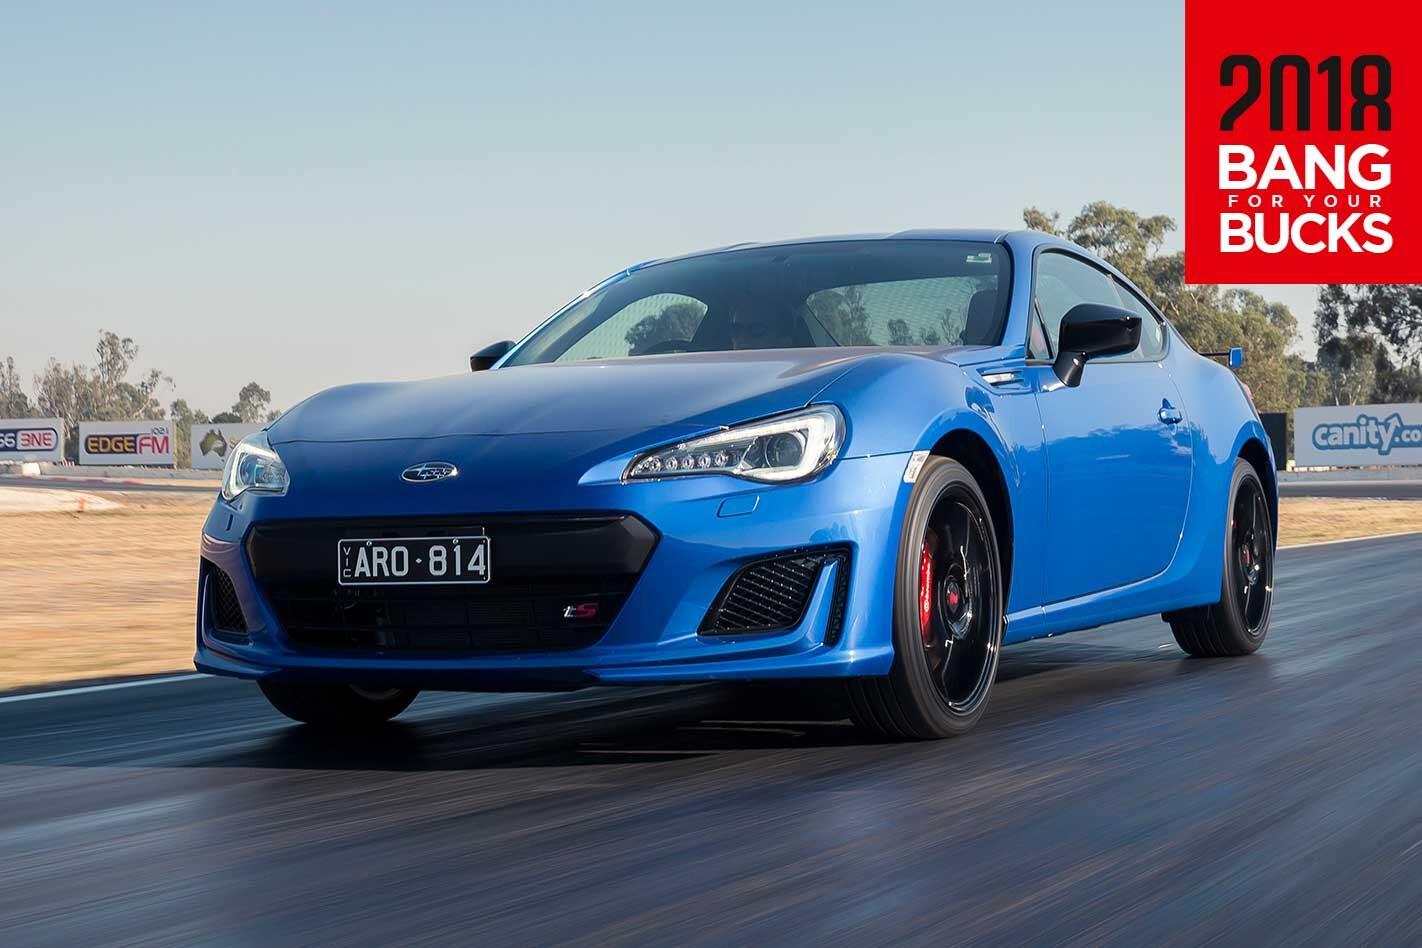 2018 Subaru BRZ tS track review